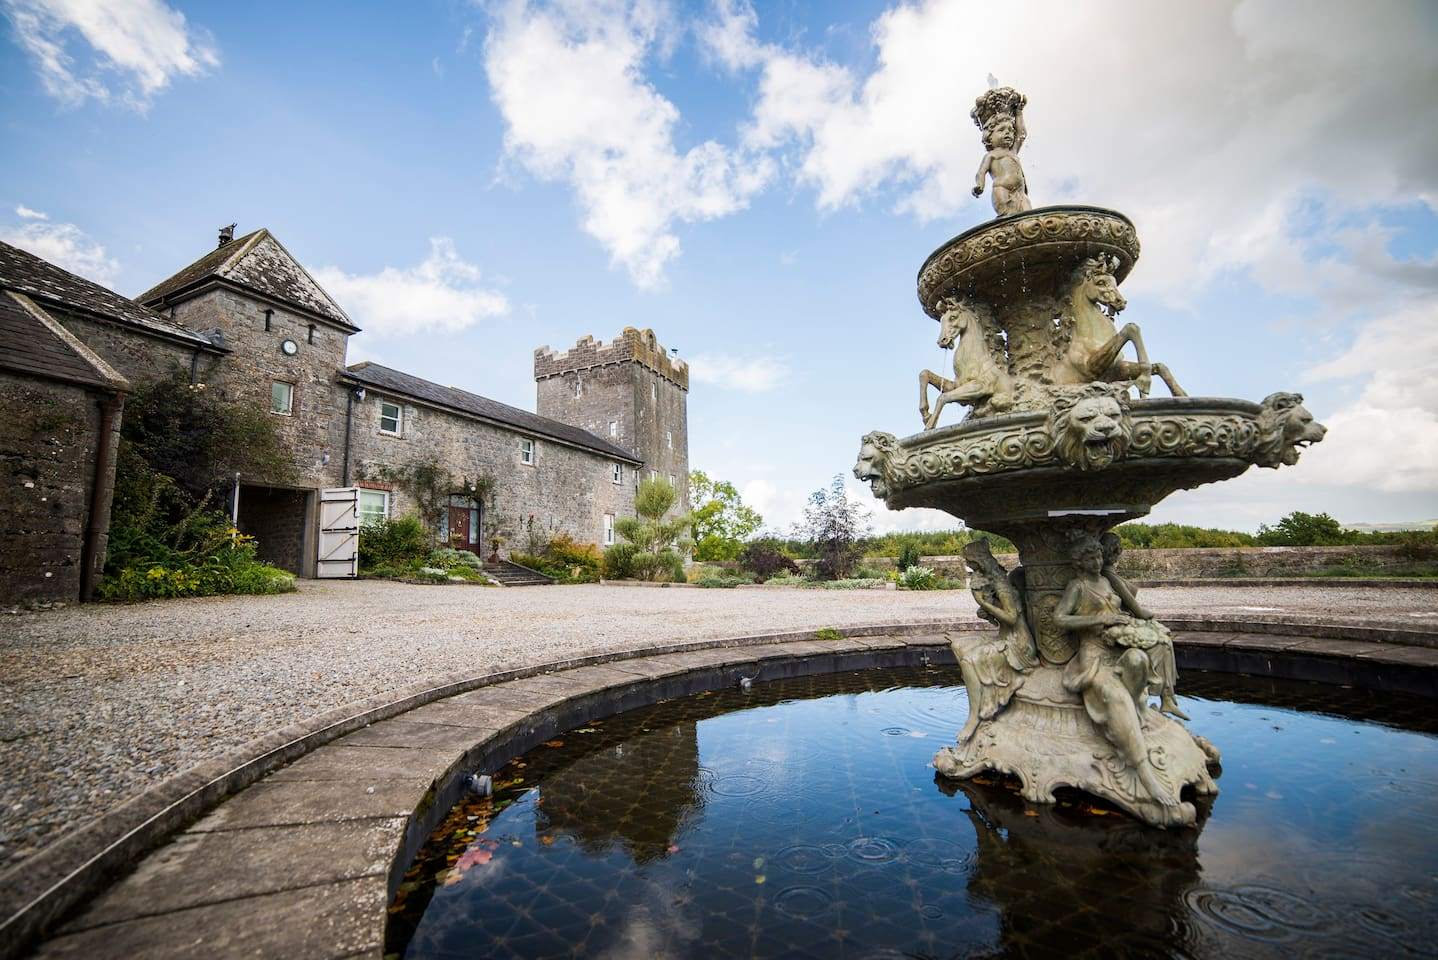 Luxurious restored Irish castle